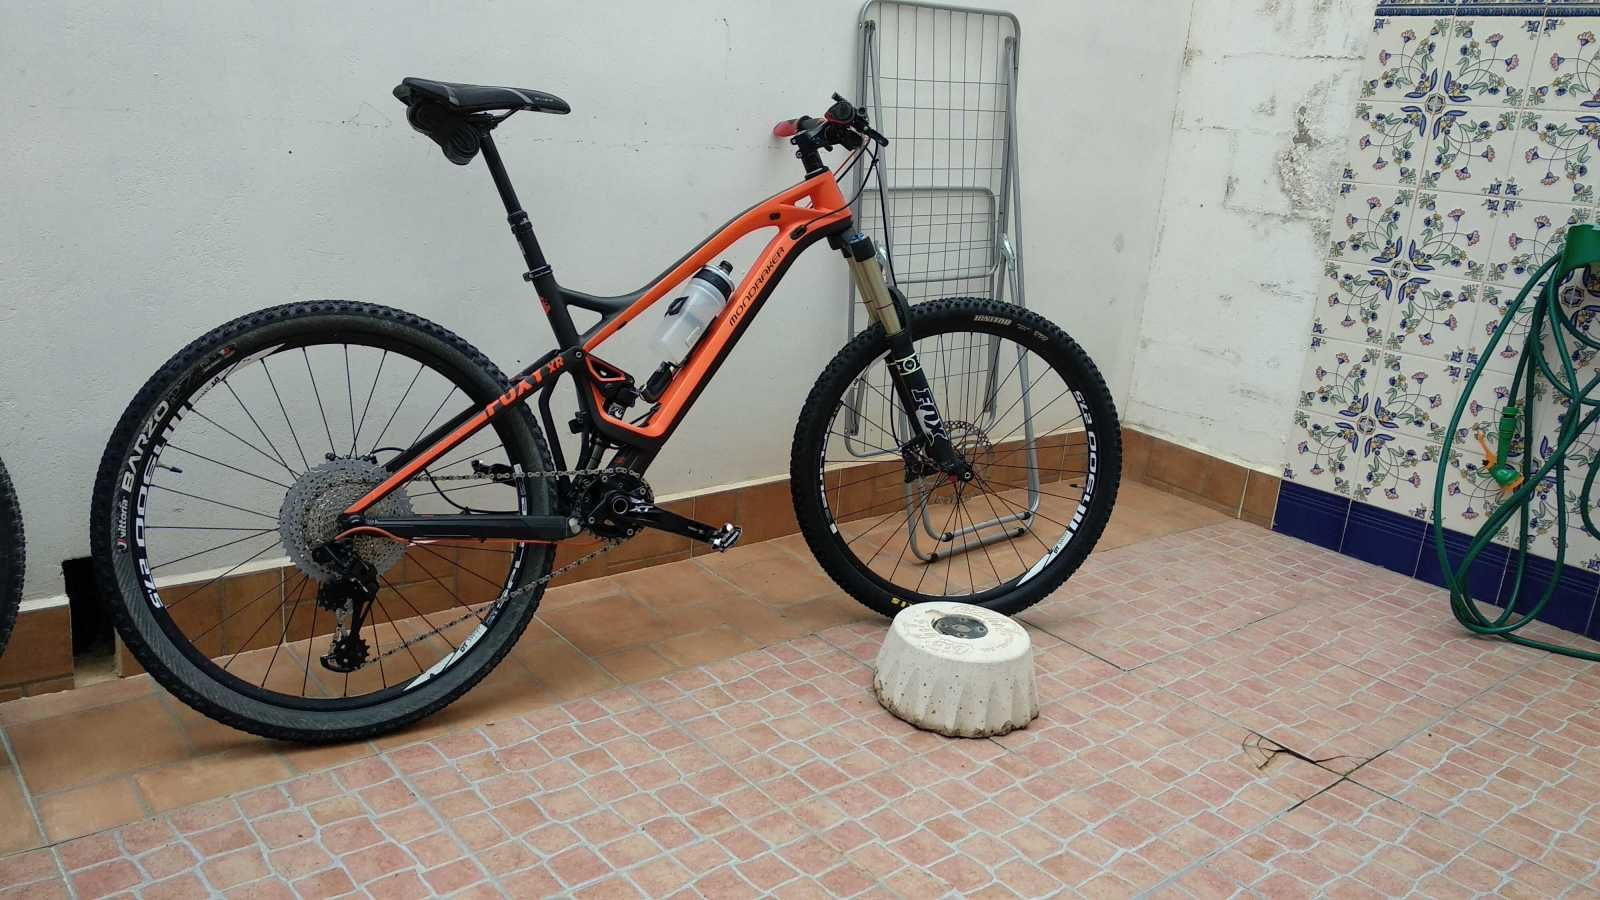 Bicicleta De Montaña Mondraker Foxy Carbon Xr Ref 37420 Talla M Año 2014 Cambio Sram Gx Cuadro De Carbono Bicicletas Bicicletas De Montaña Bicicletas Mtb